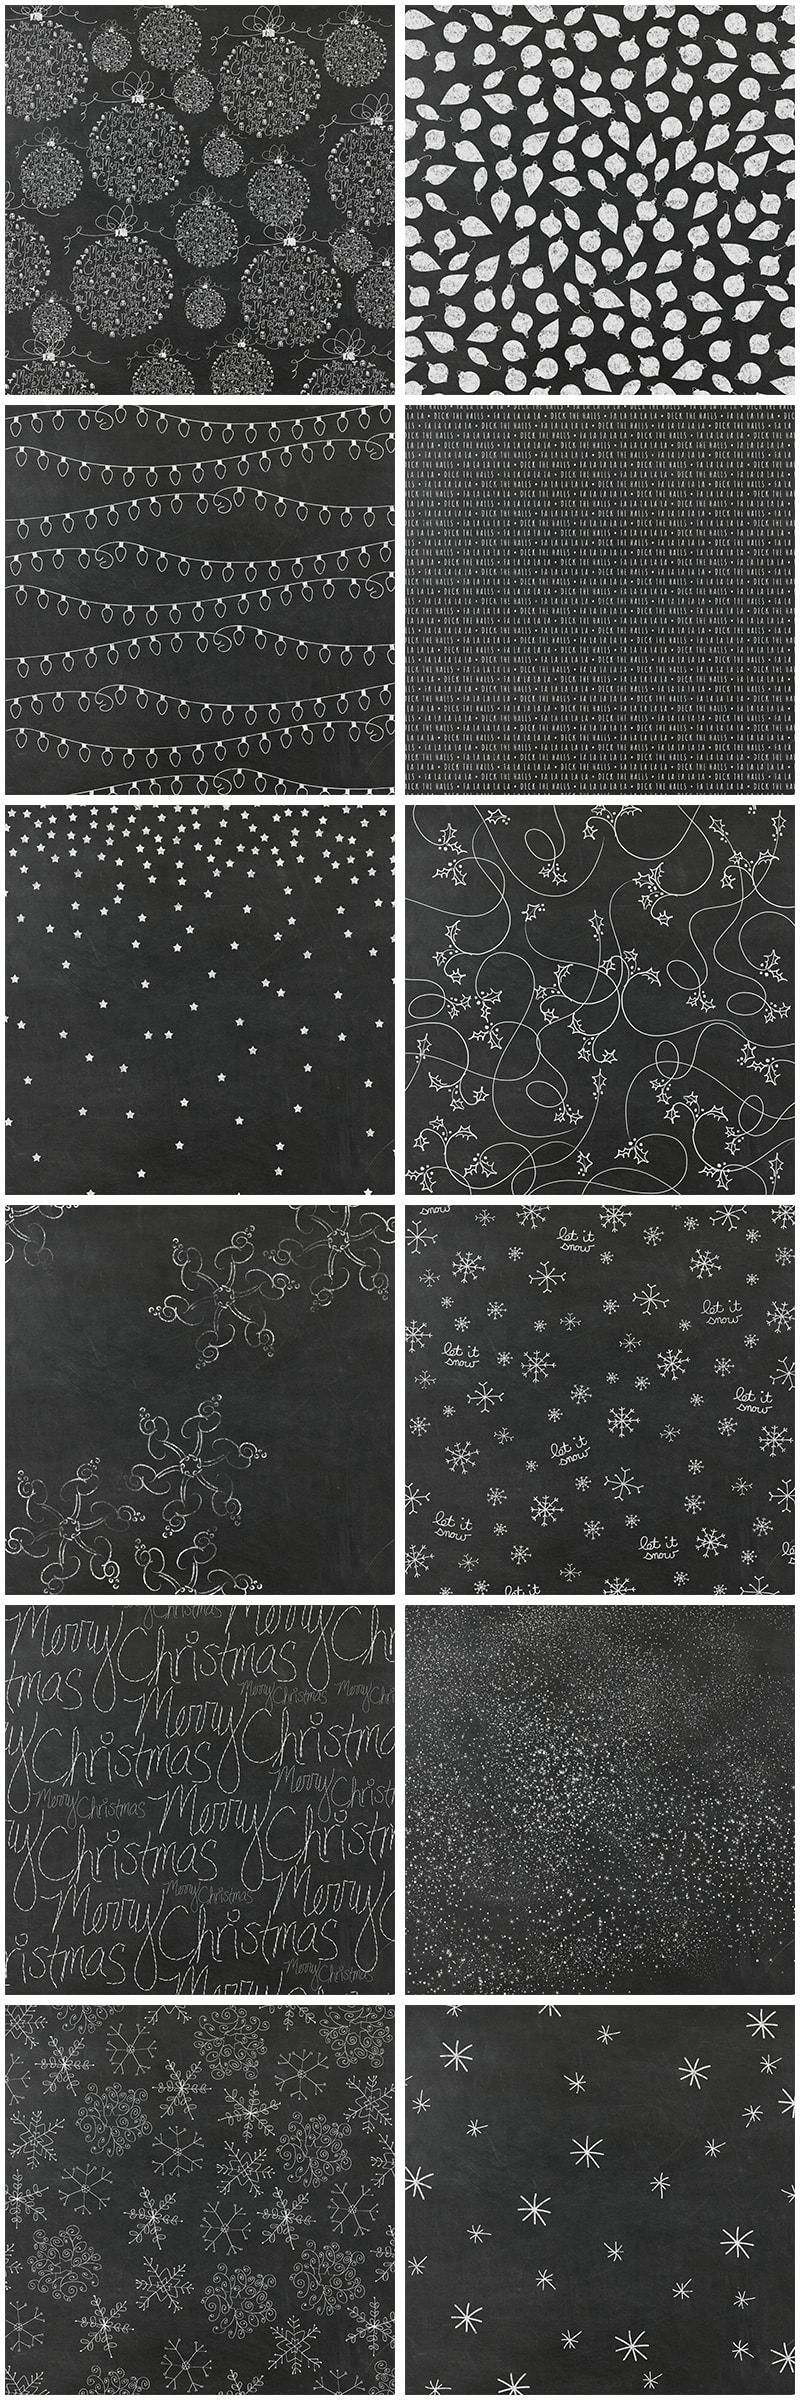 Chalkboard Christmas Digital Paper